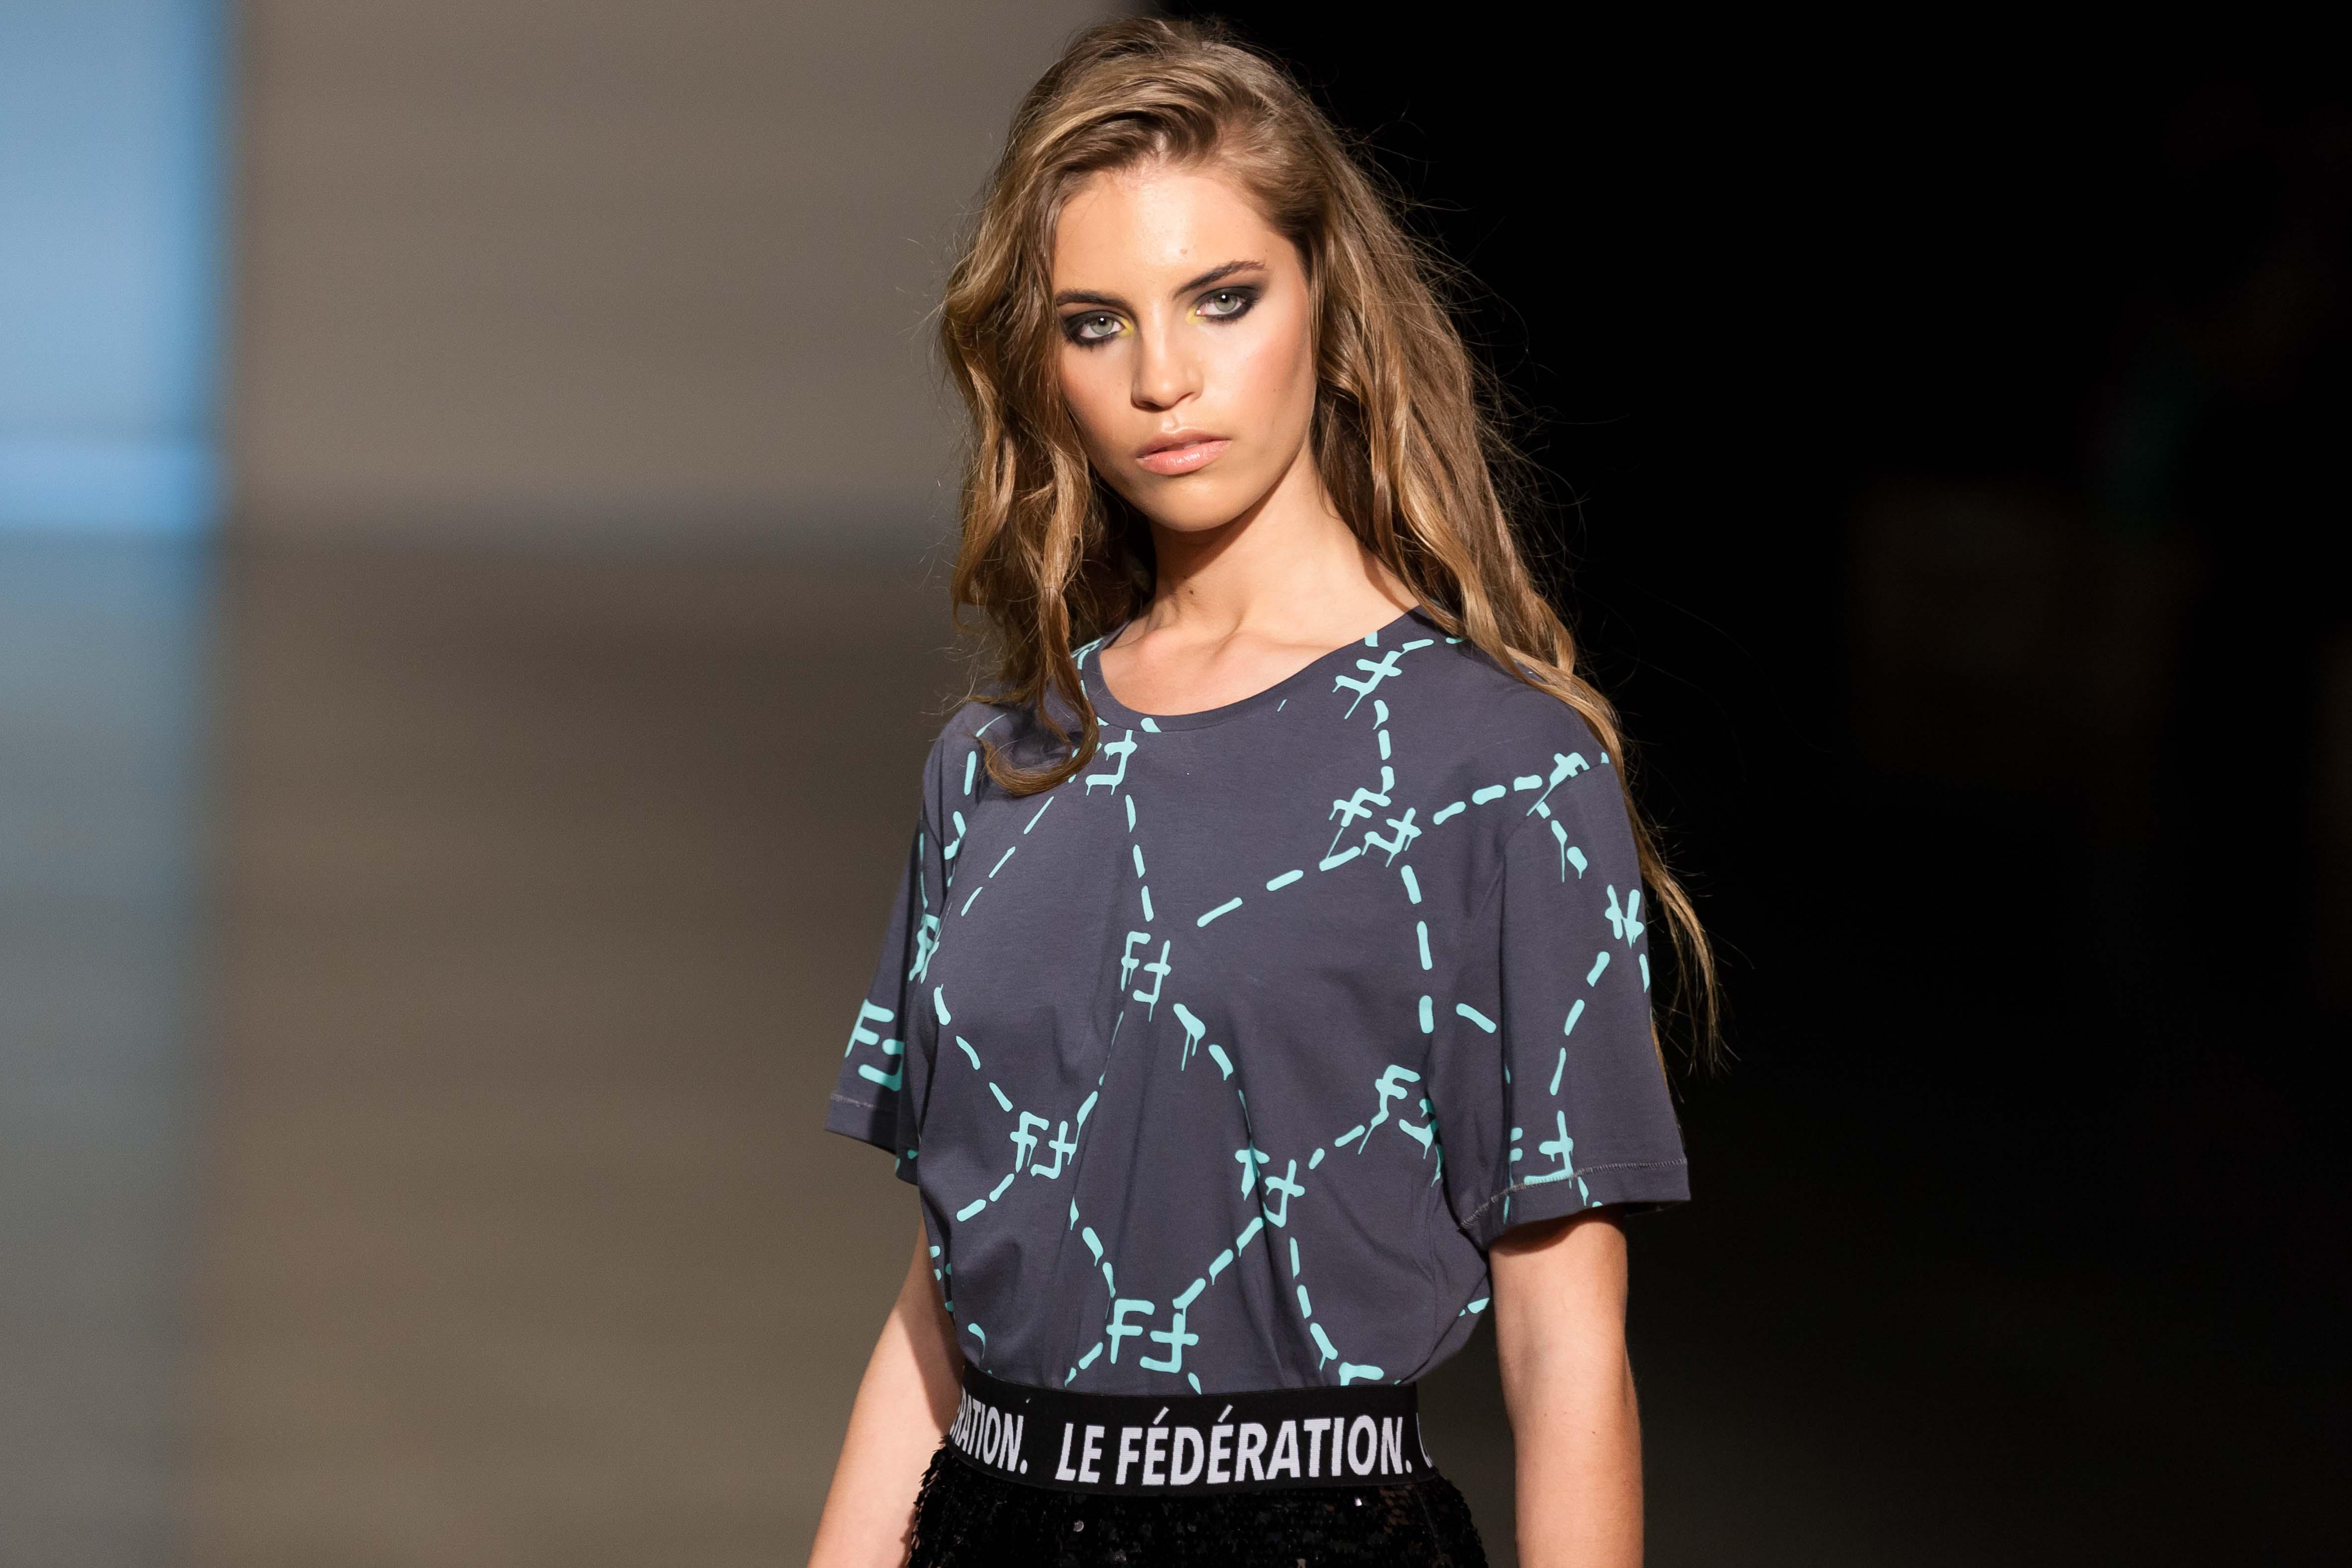 Federation - LUKE FOLEY-MARTIN-7